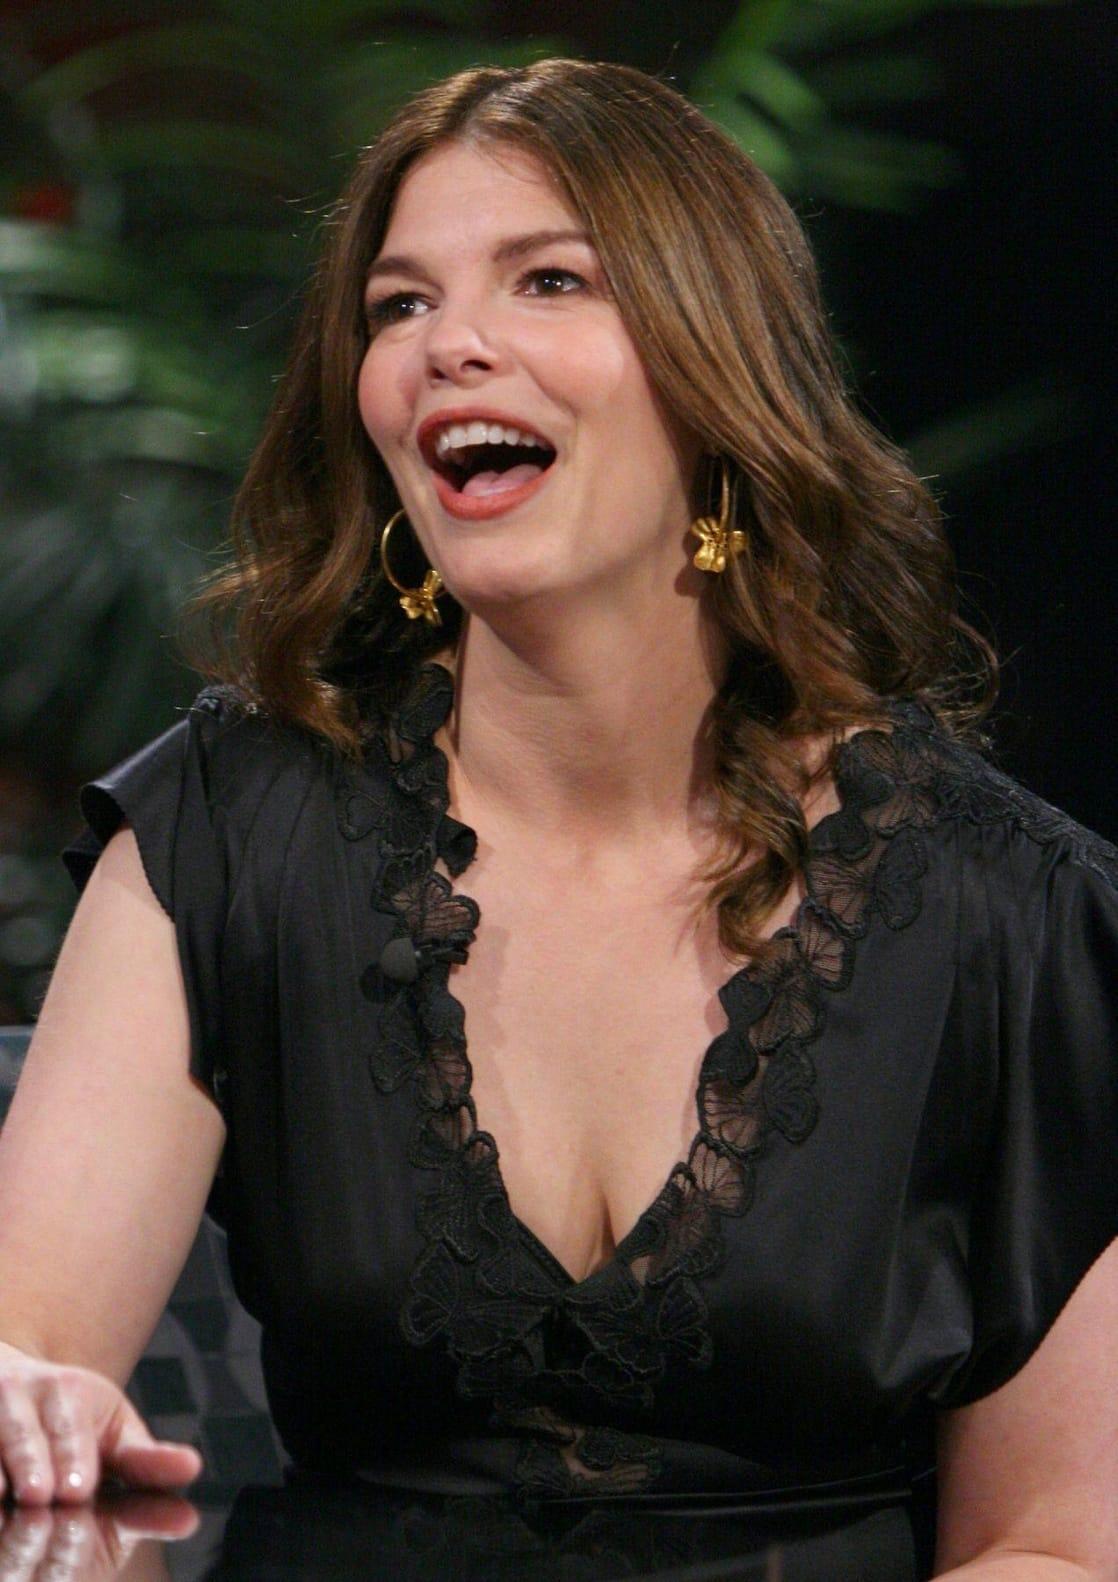 Dannielle Brent (born 1979) forecasting